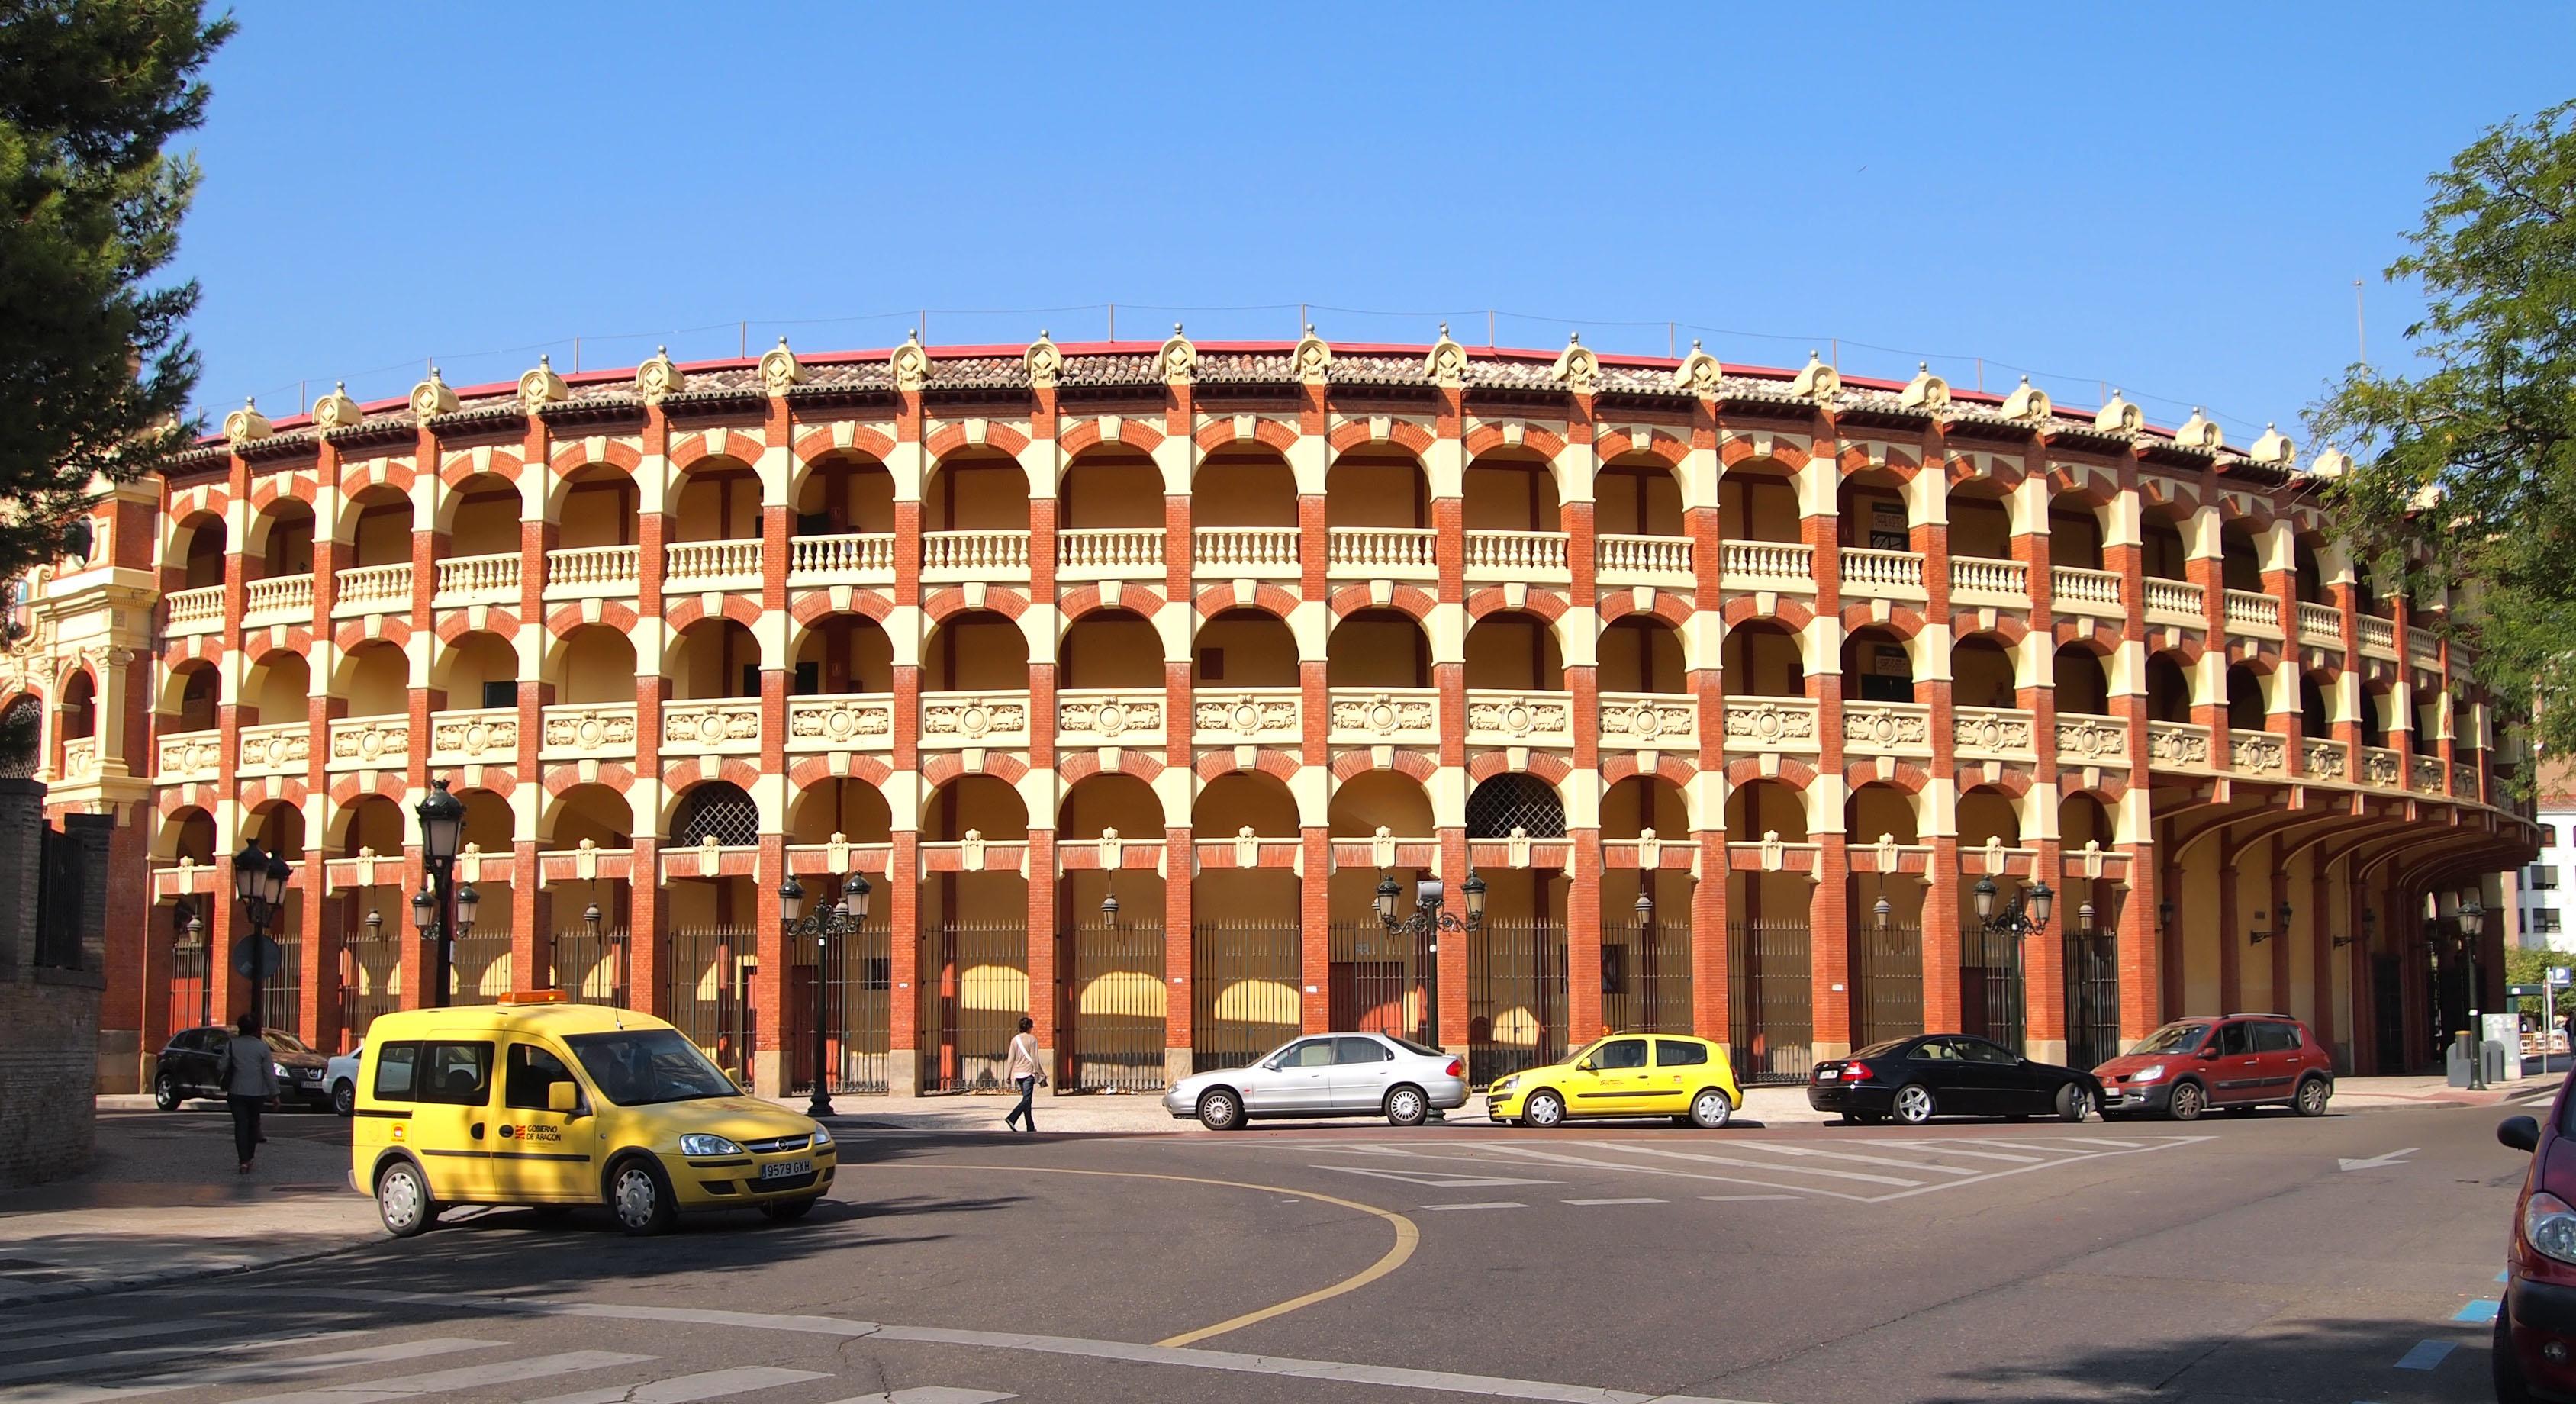 Plaza de toros de Zaragoza - Wikiwand